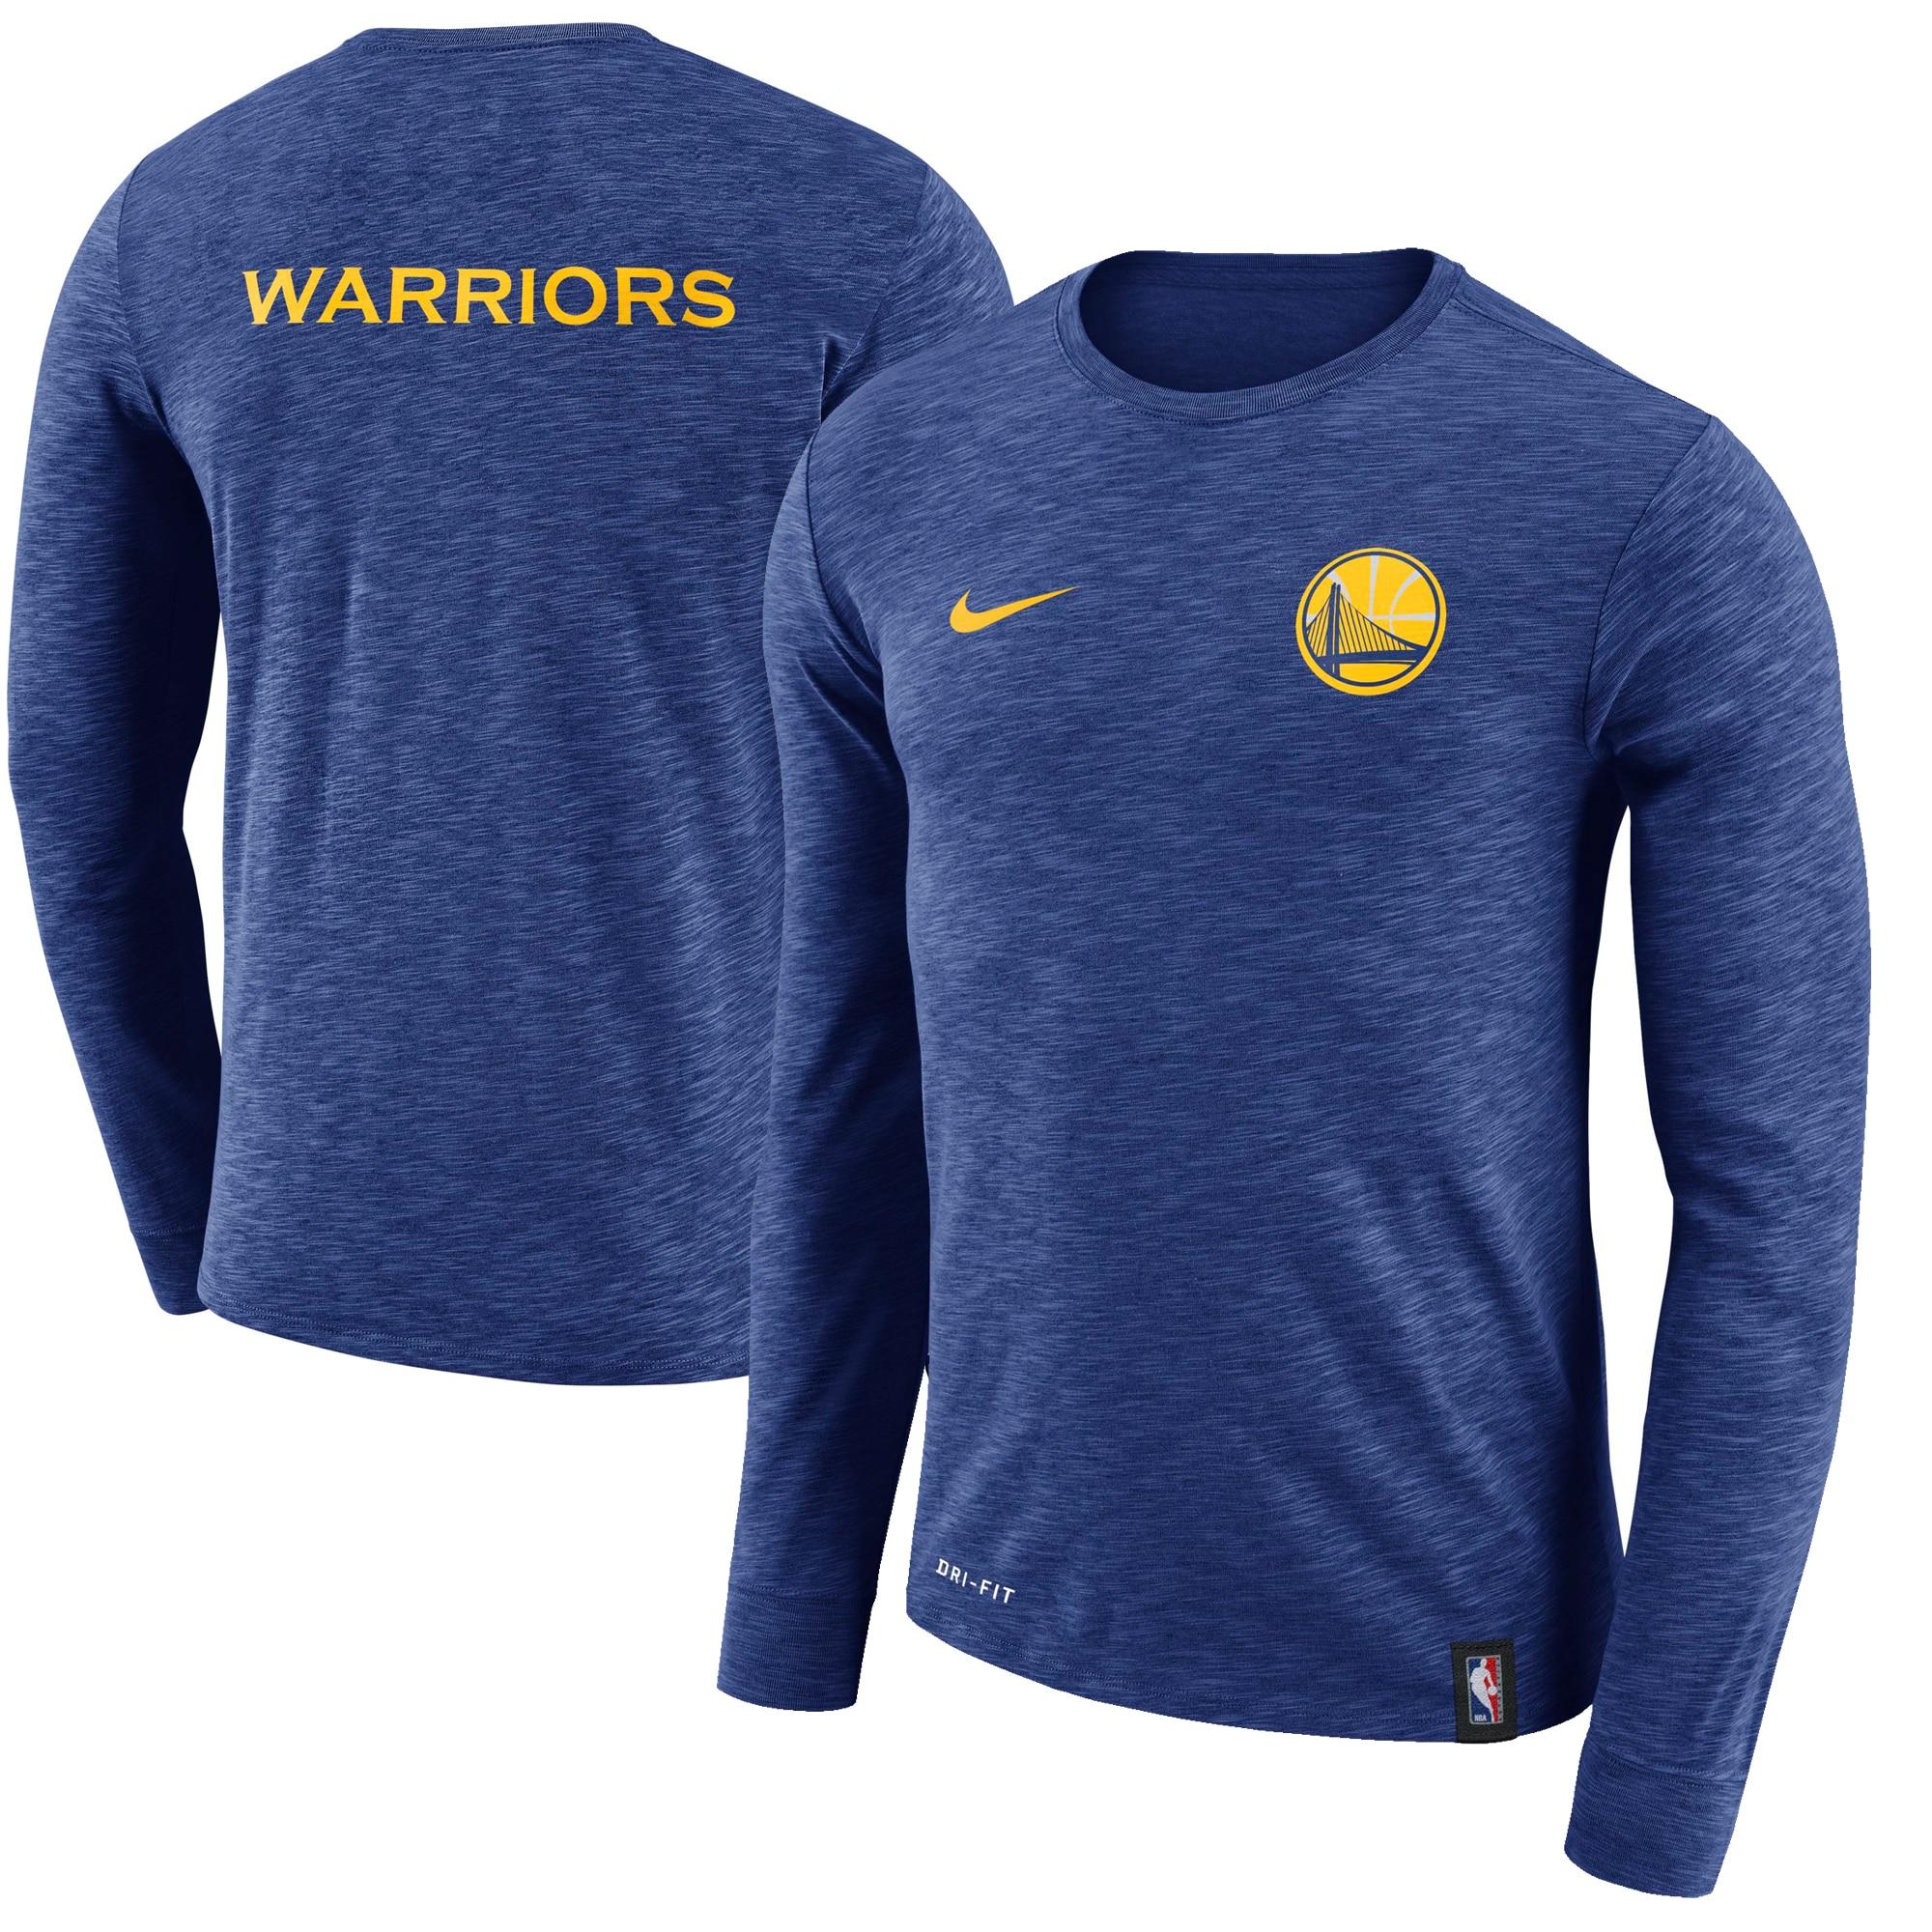 Golden State Warriors Nike Facility Long Sleeve T-Shirt - Royal